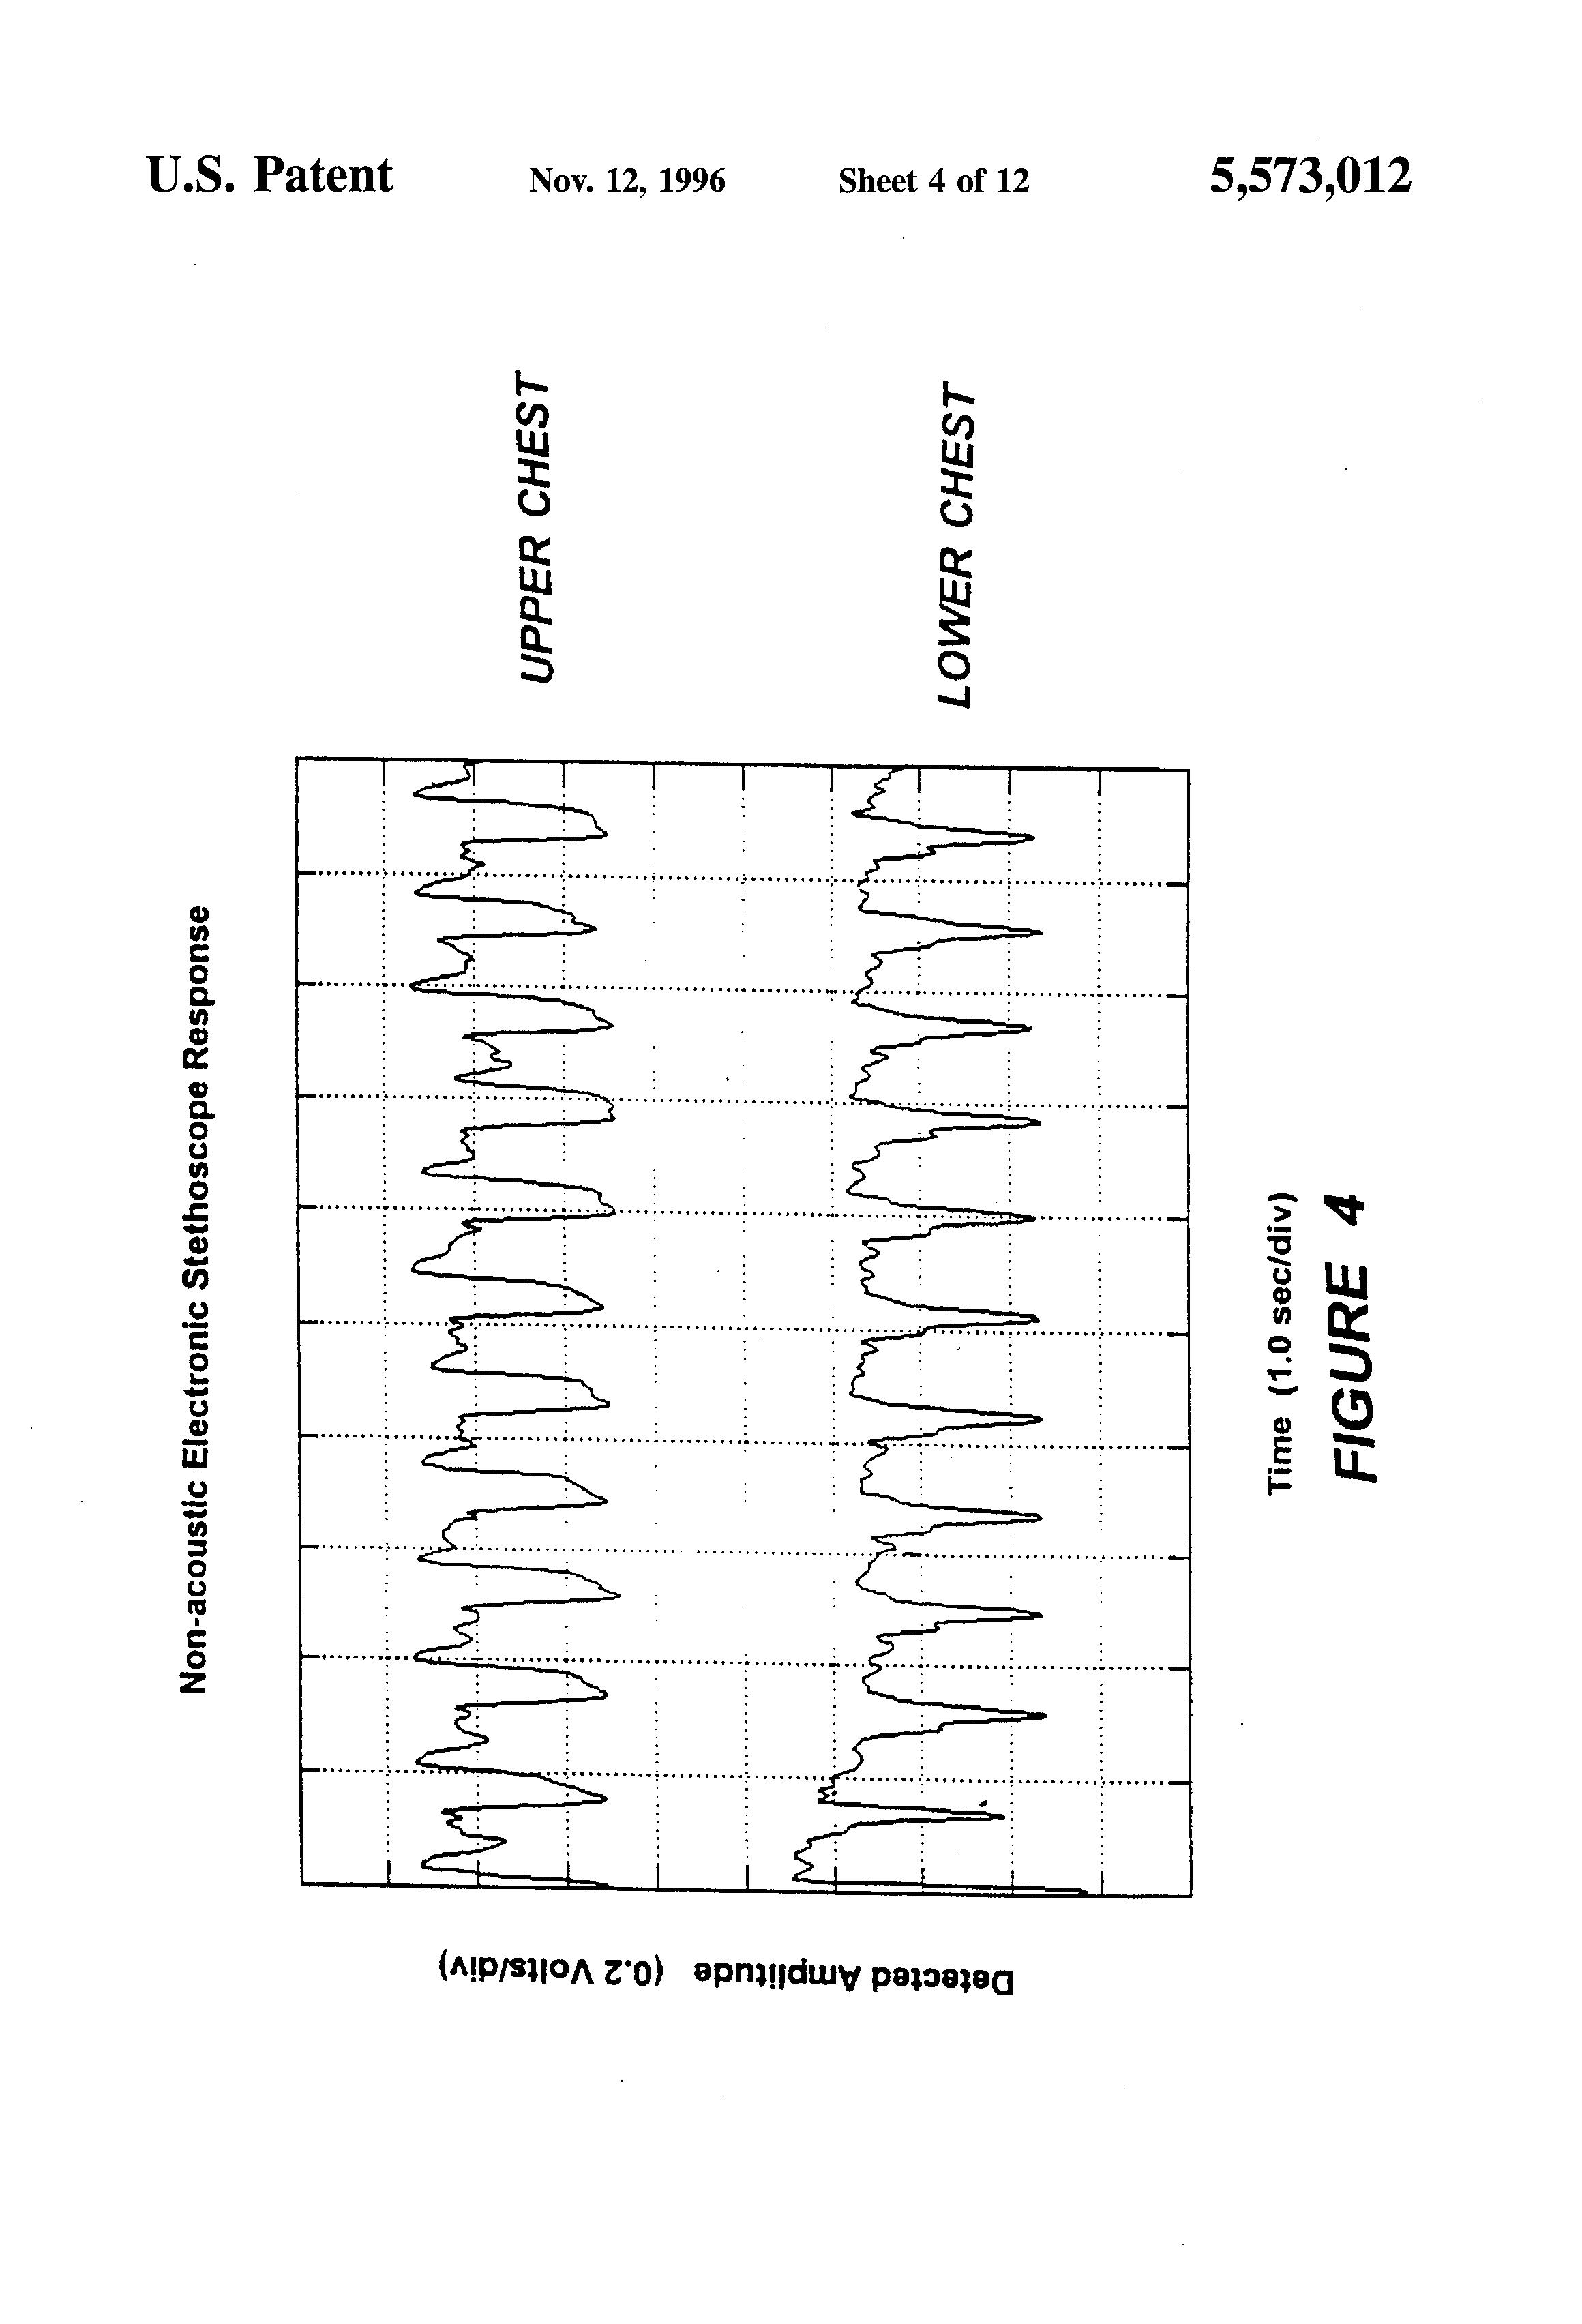 Simple Sinewave Generator Circuit Diagram Tradeoficcom Sine Wave Electronic Patent Us5573012 Body Monitoring And Imaging Apparatus Method